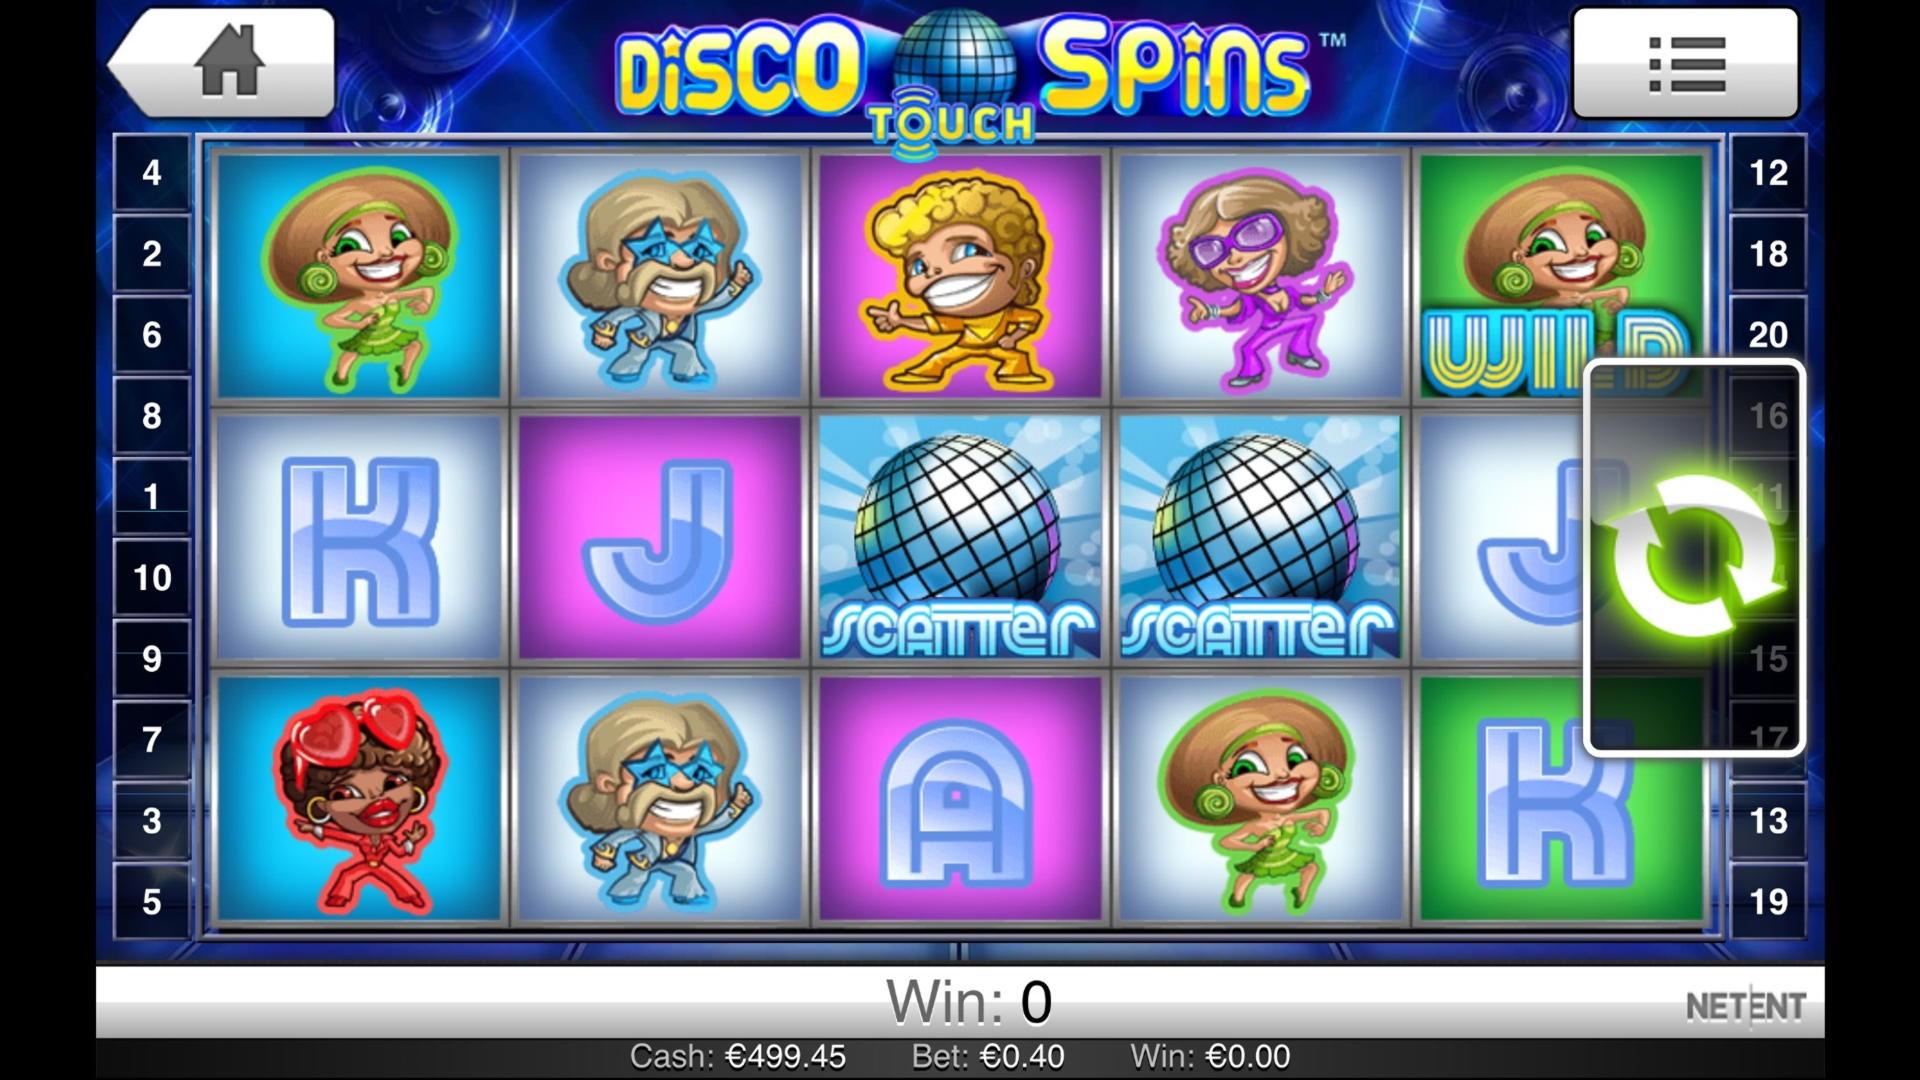 EURO 115 Casino.com- ում ավանդ չկա